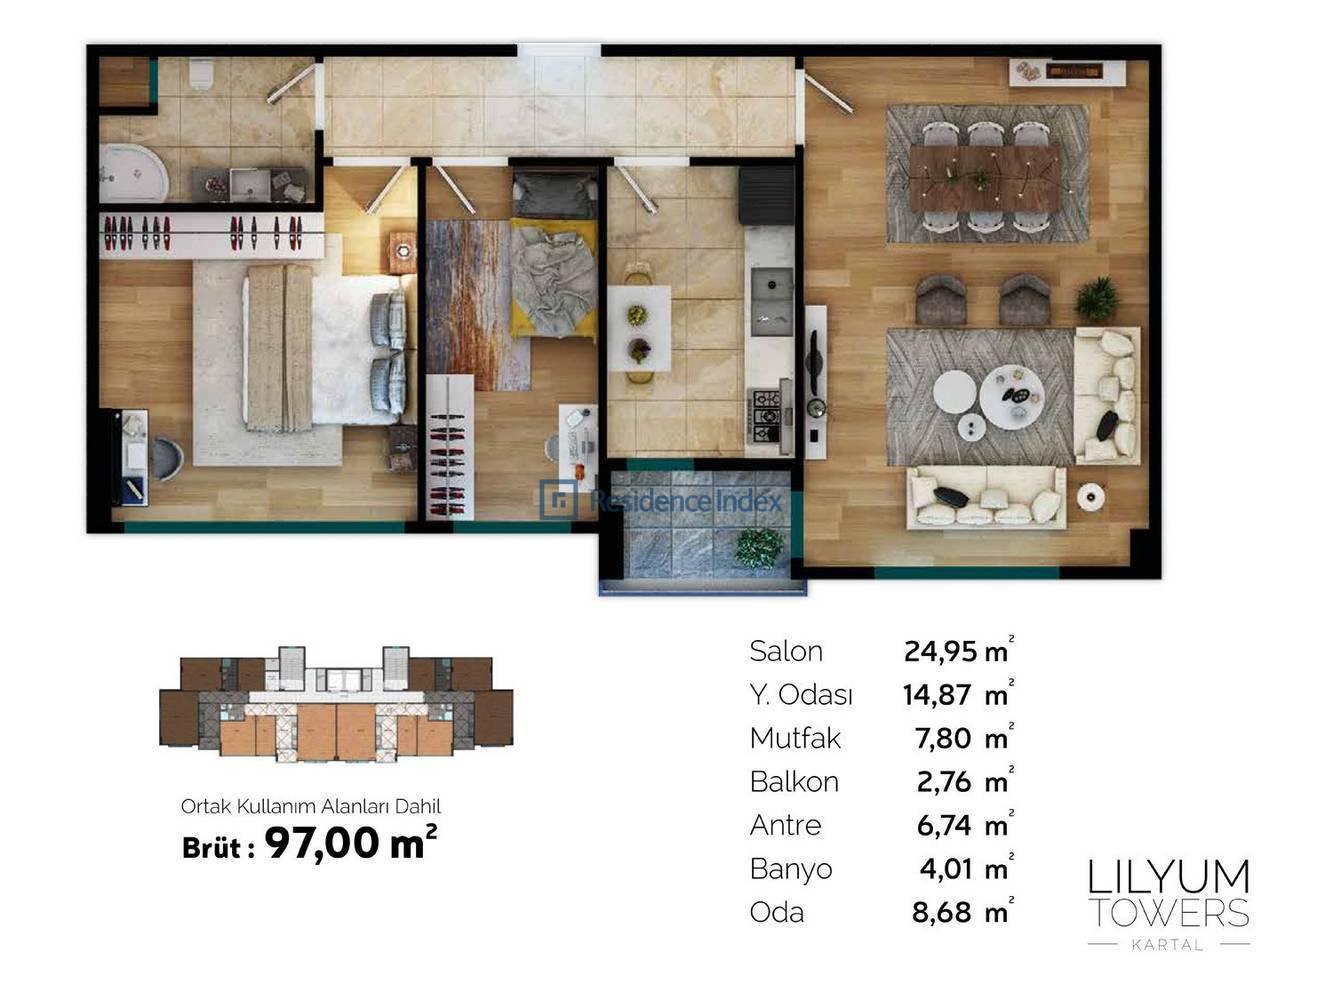 Lilyum Towers B